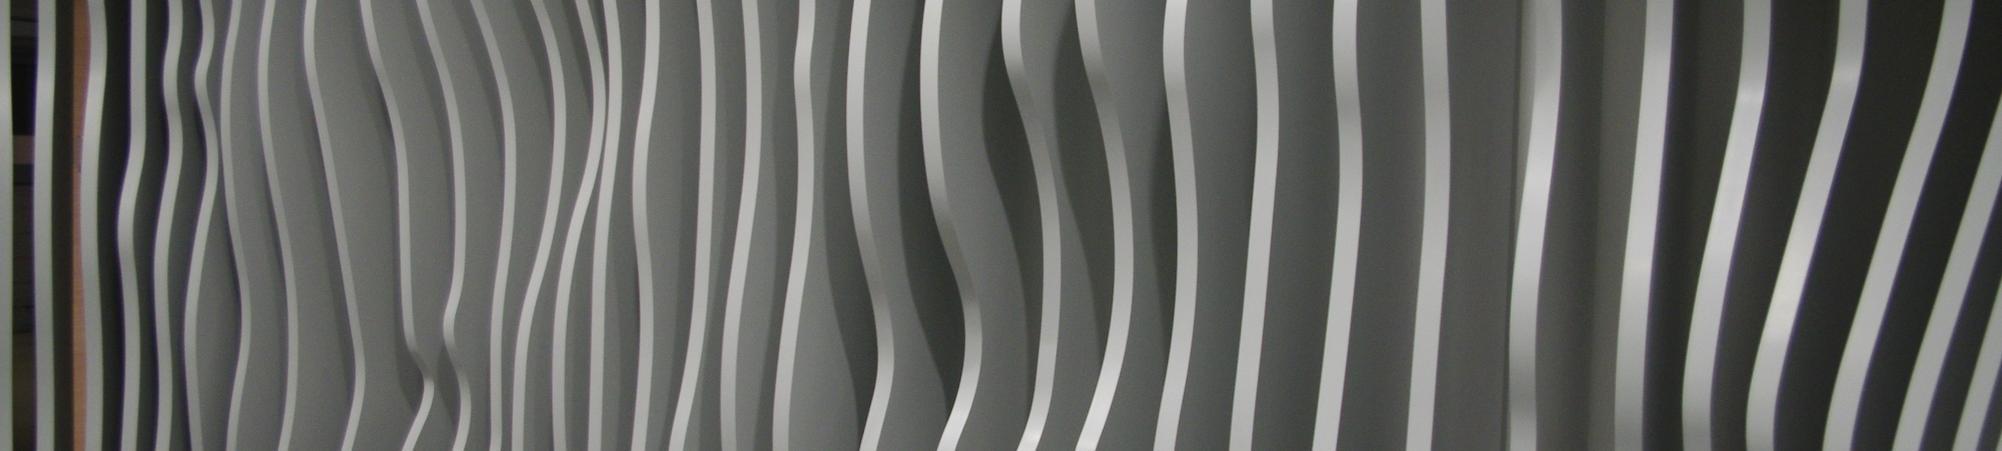 Tischlerei Cramer Friseursalon